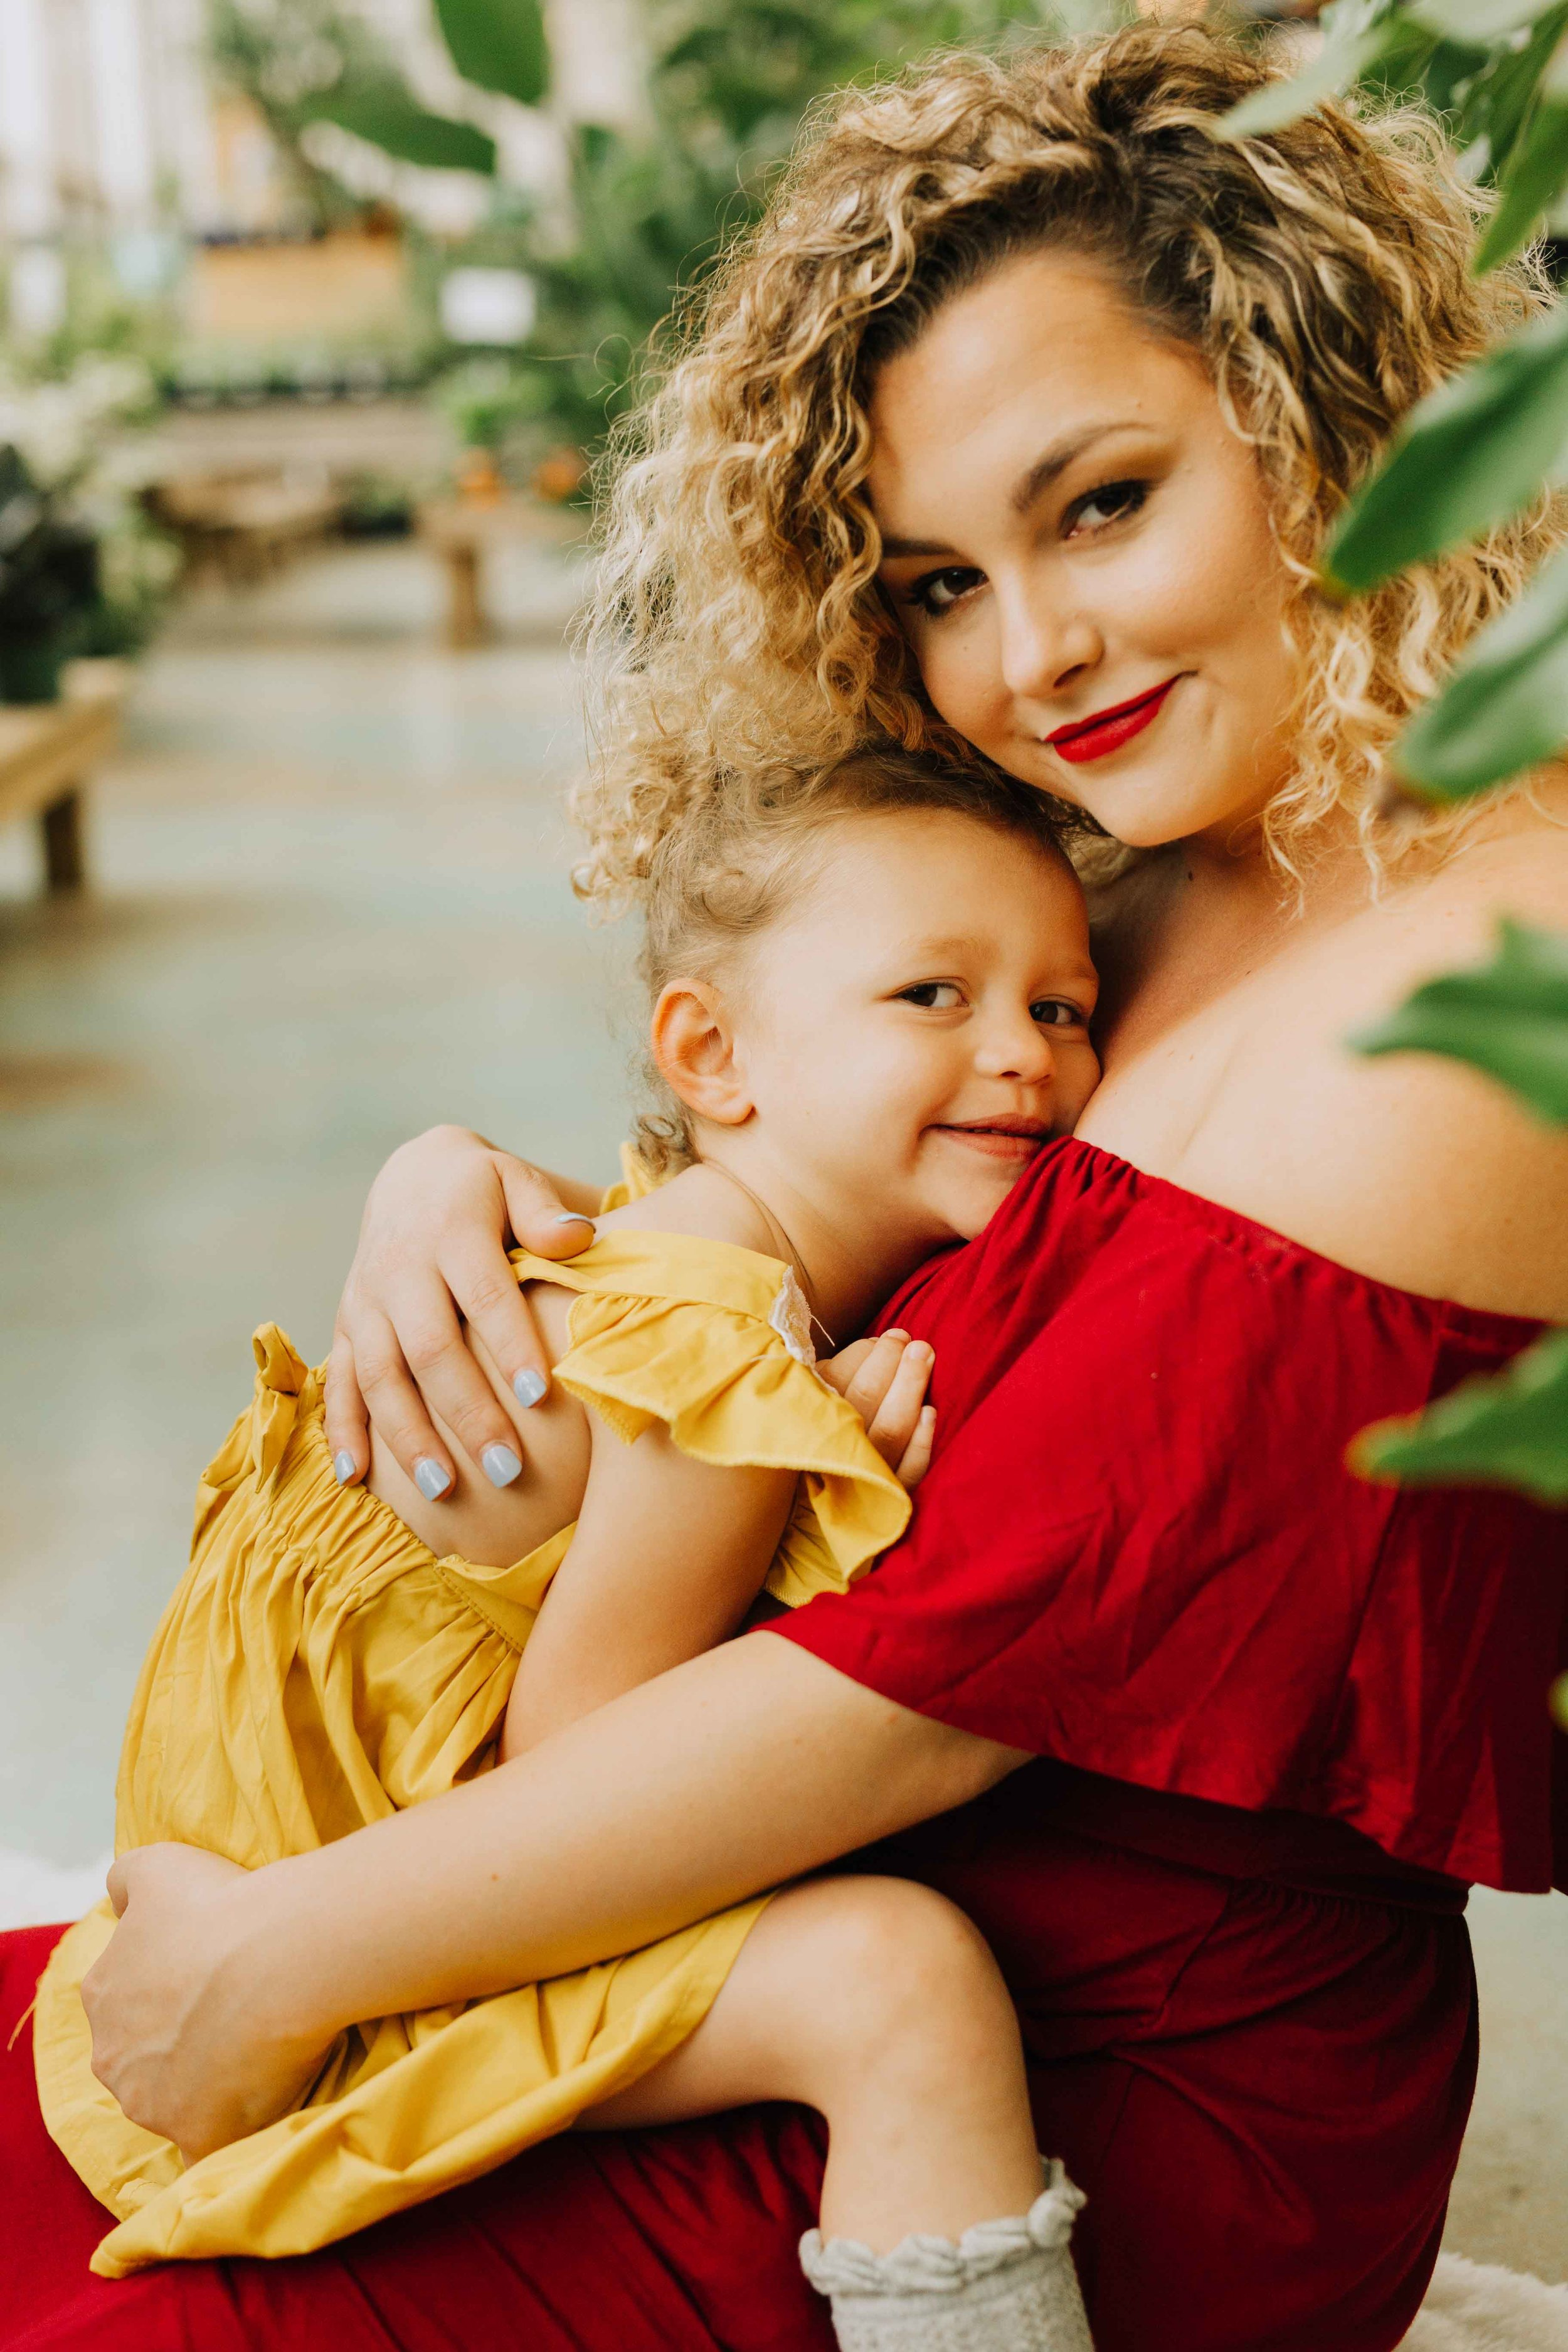 Merrifield-garden-greenhouse-indoor-Jacqueline-Waters-Photography-Red-dress-family- (138).jpg